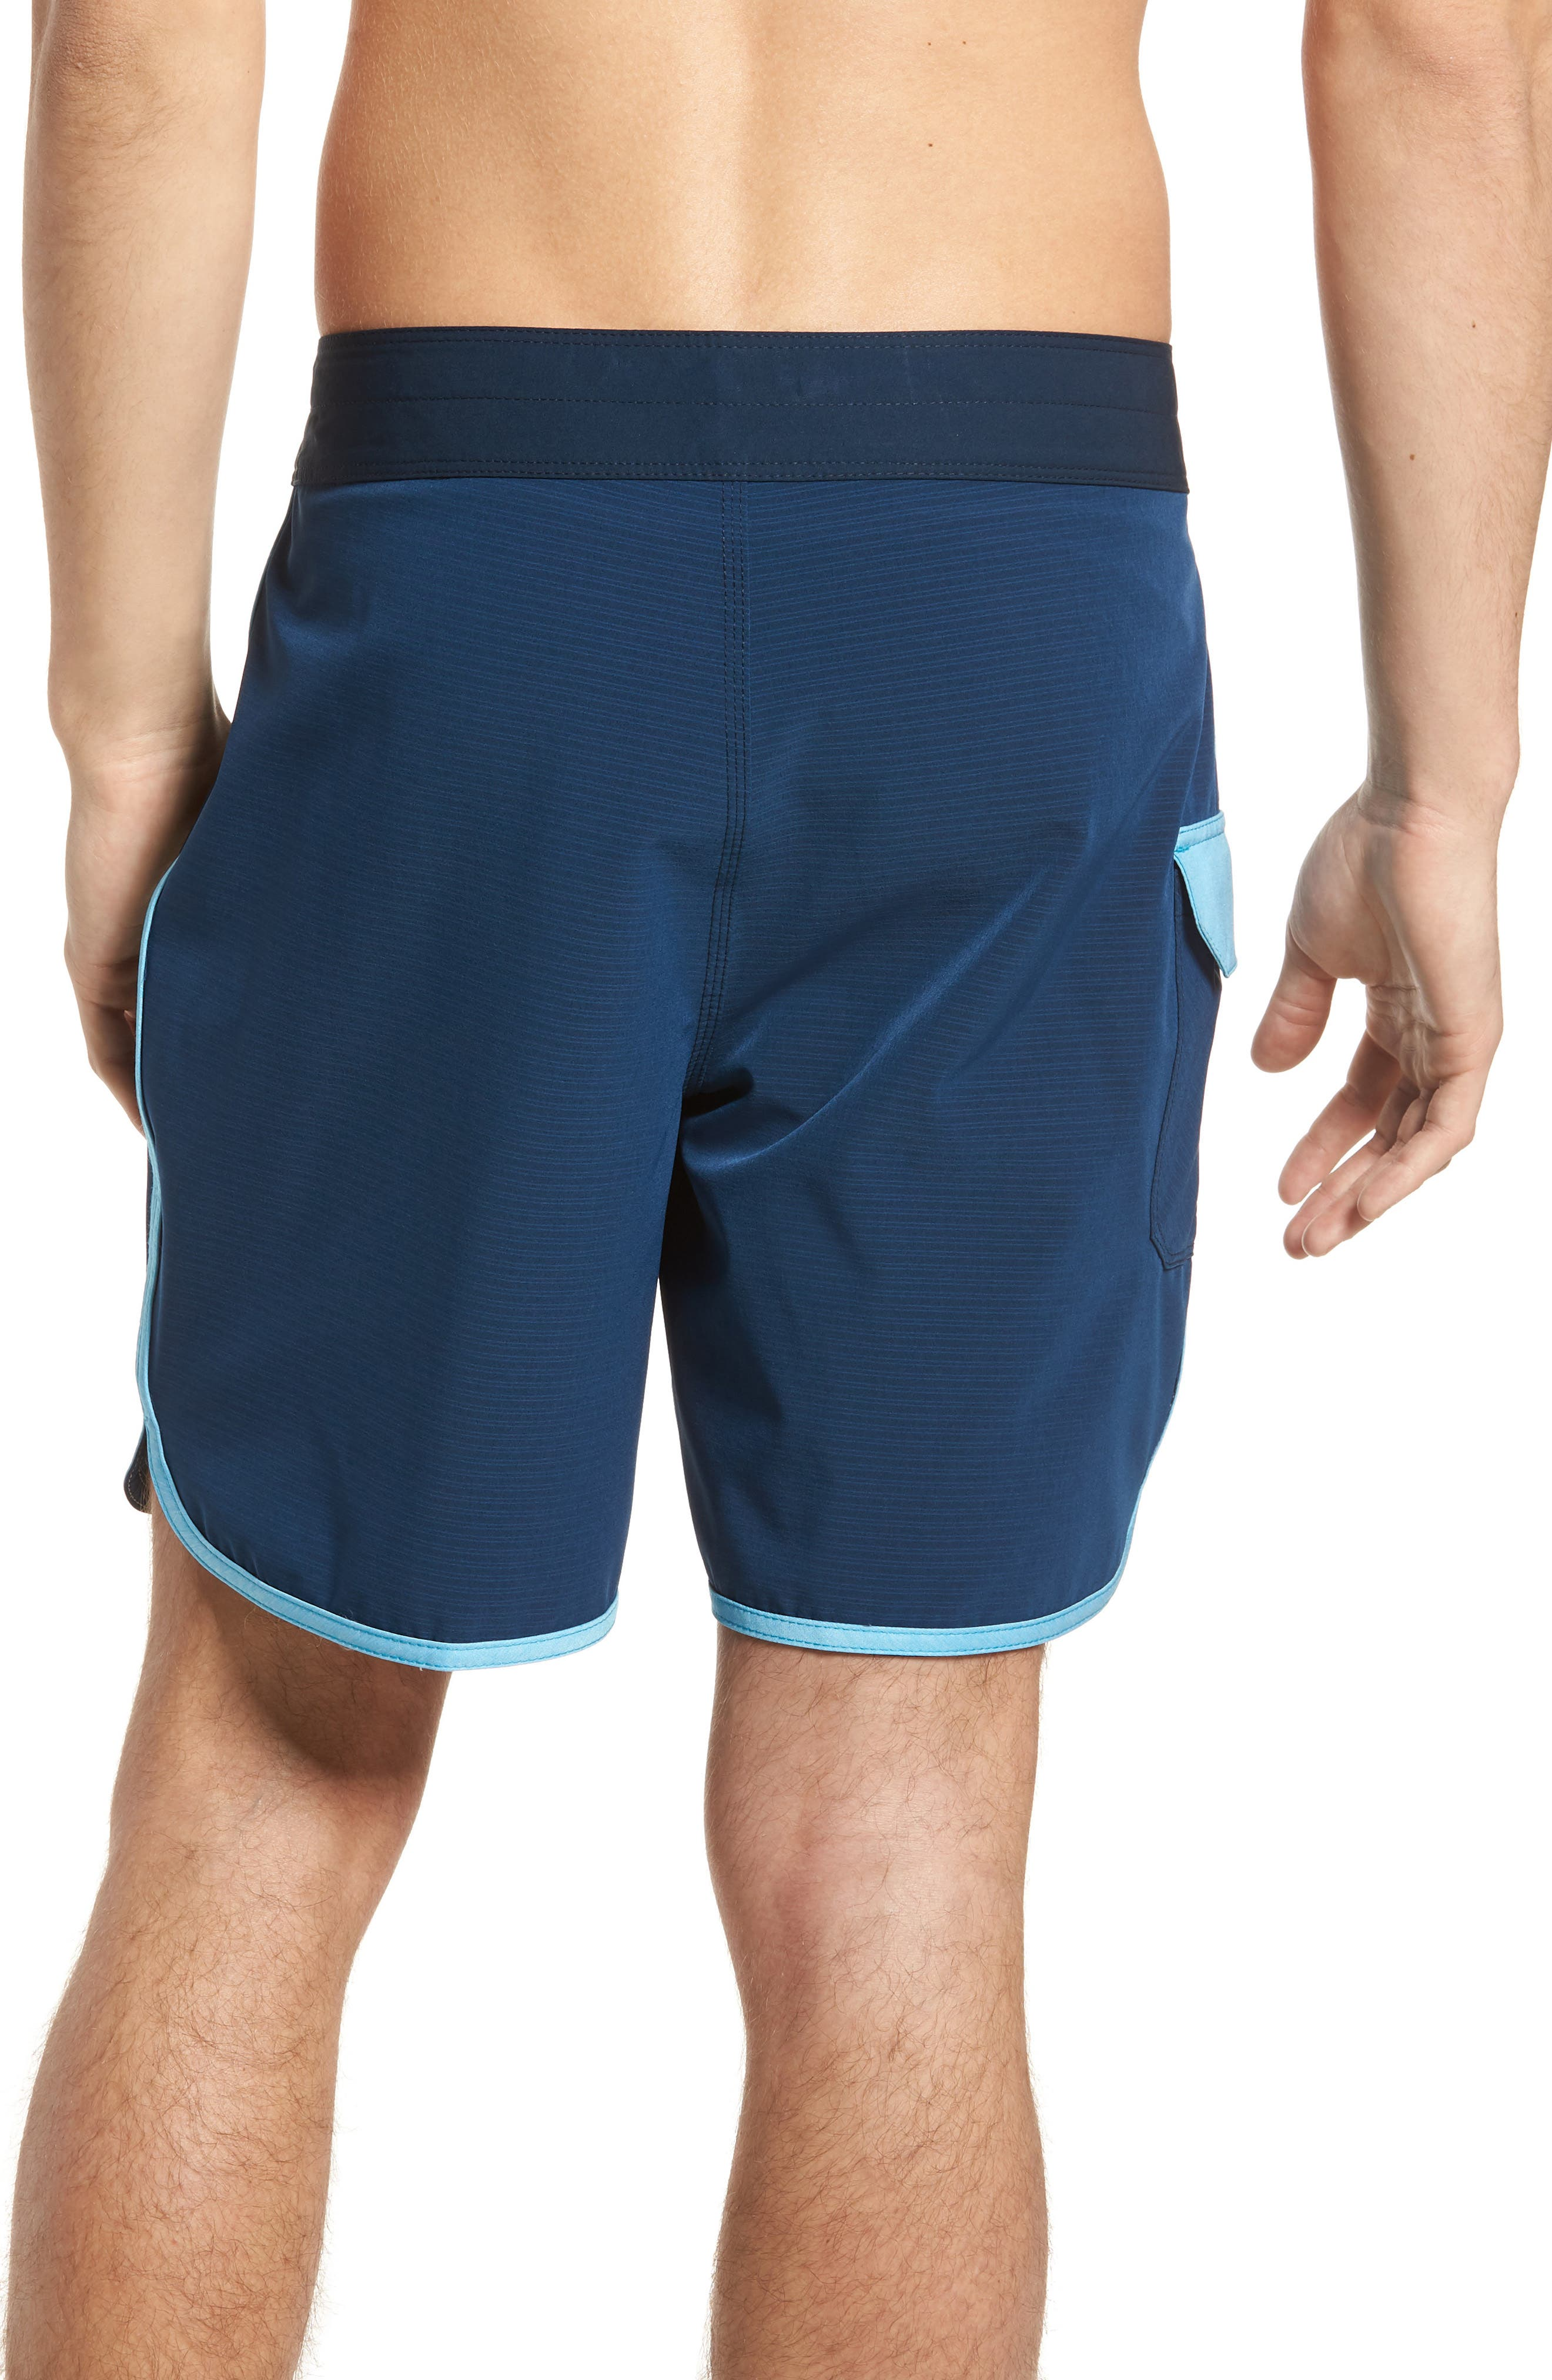 73 X Short Board Shorts,                             Alternate thumbnail 2, color,                             NAVY